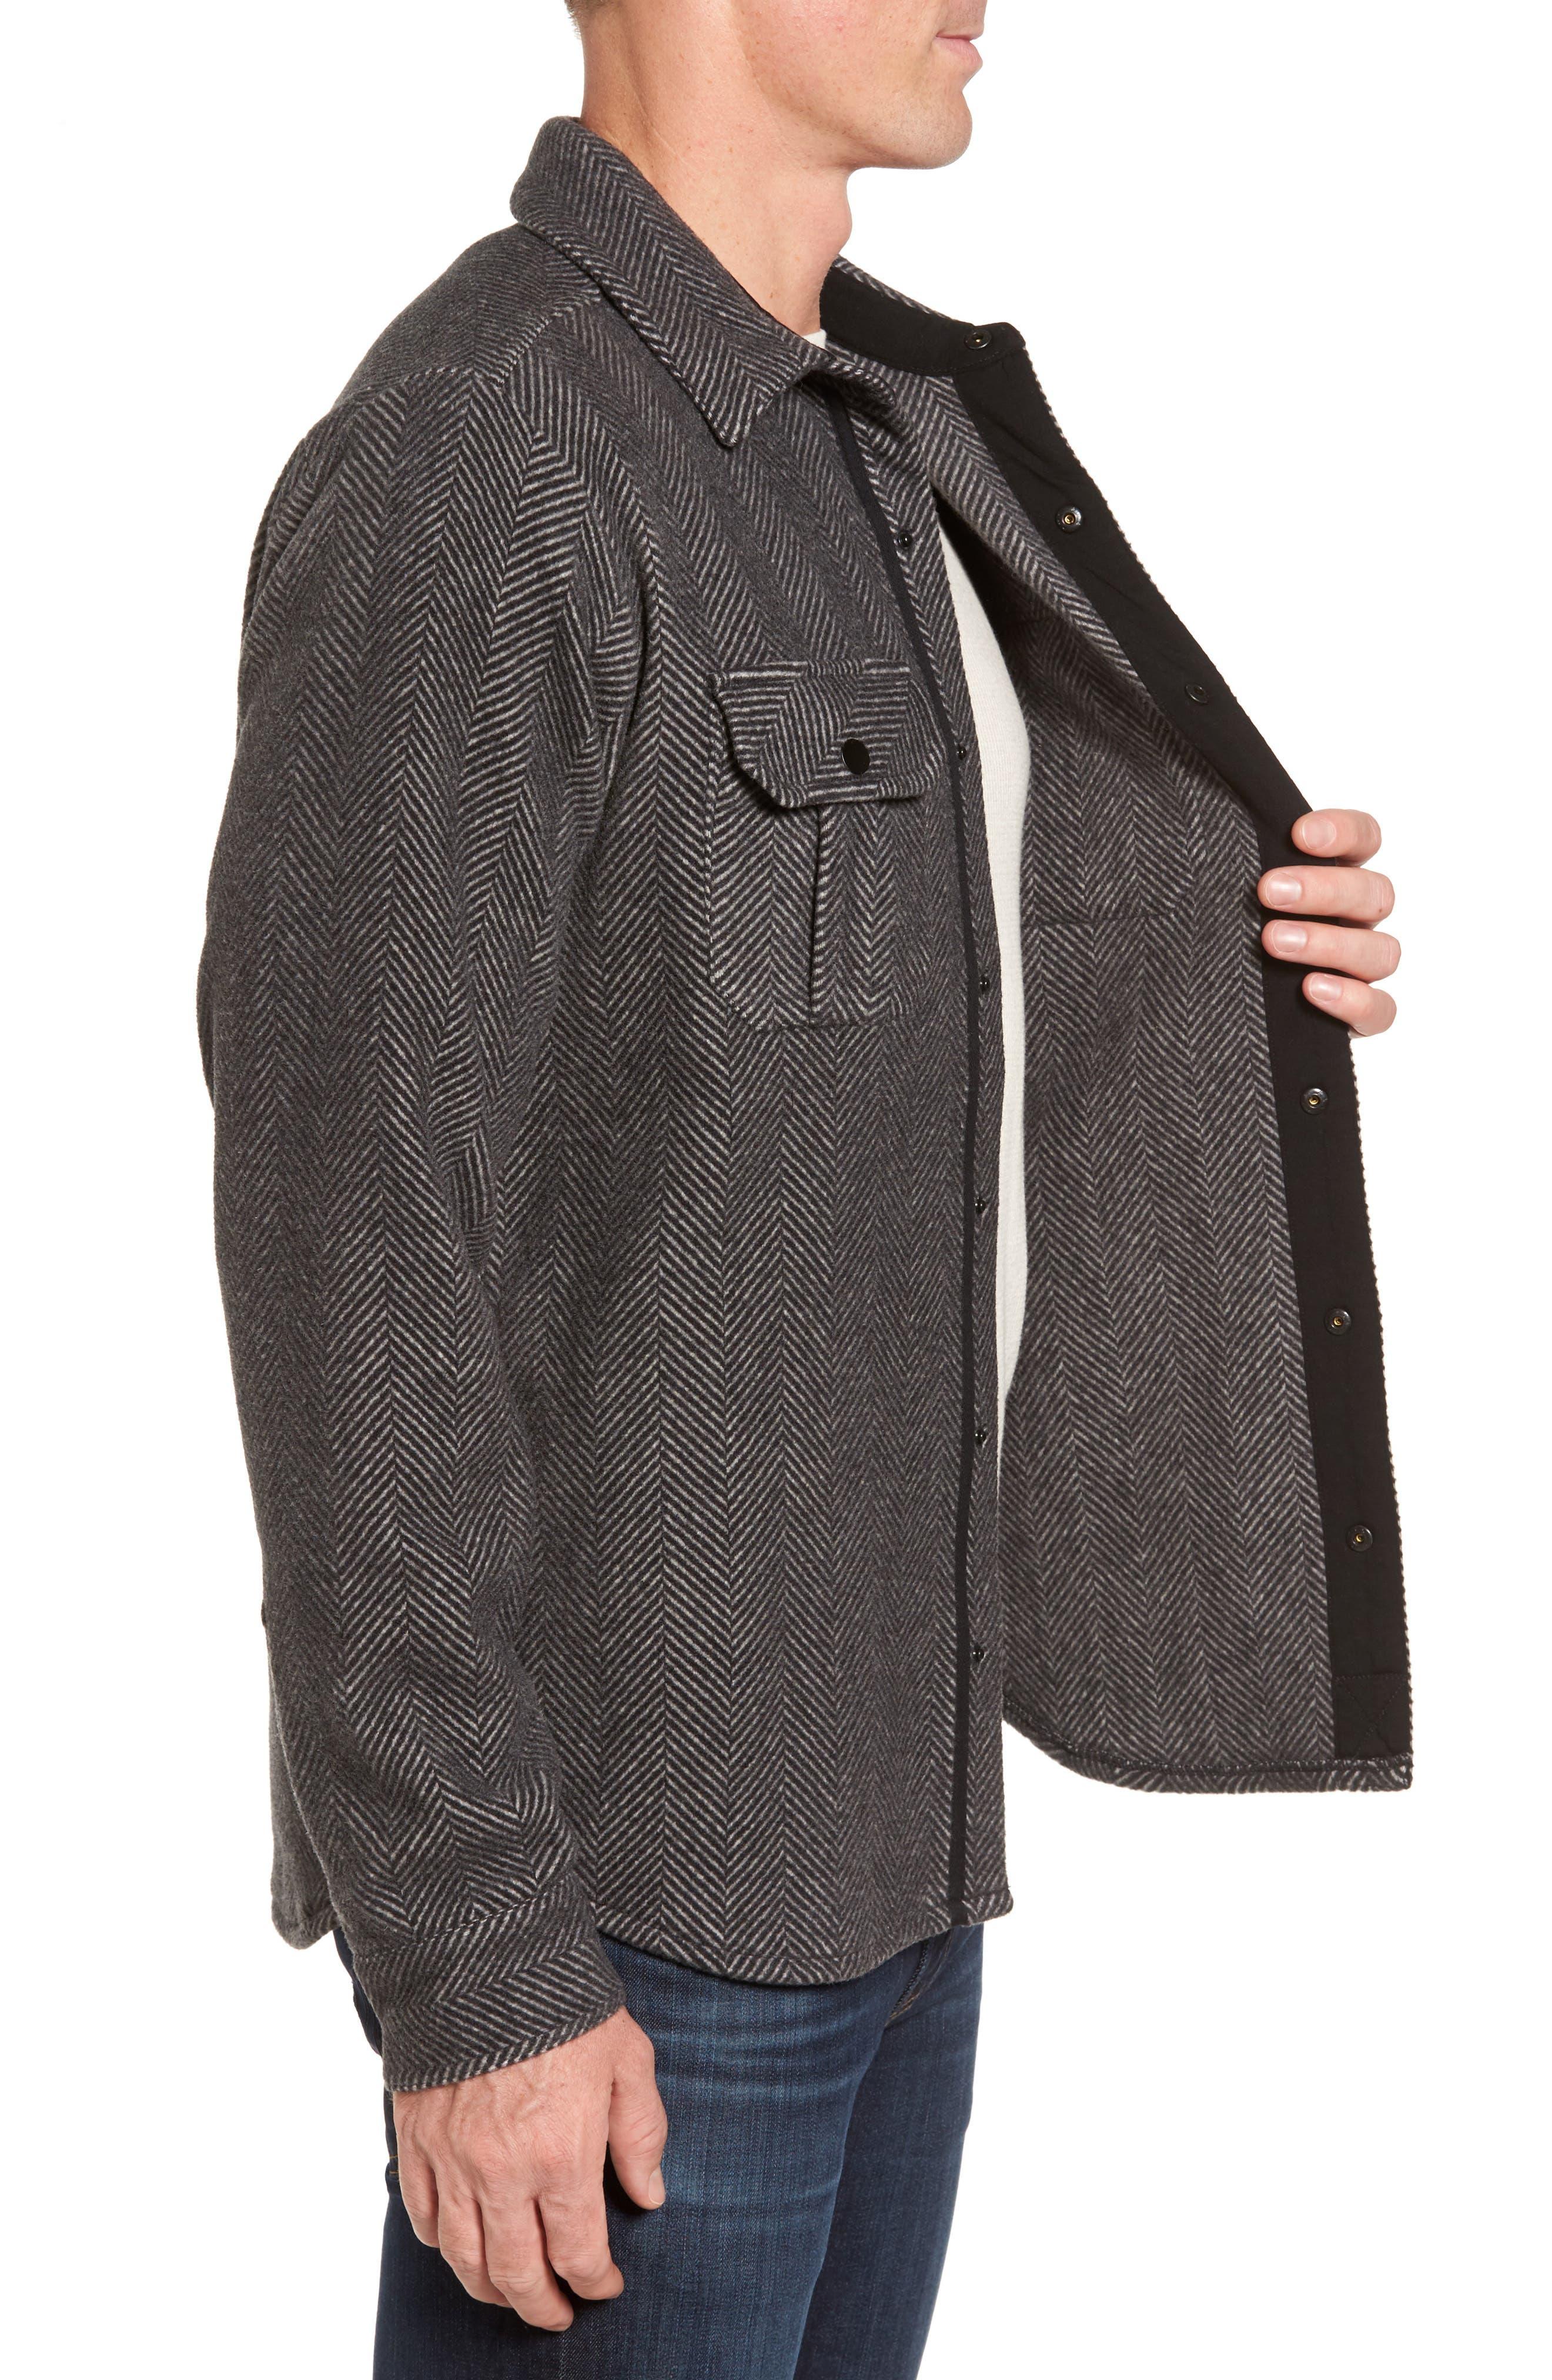 Anchor Line Herringbone Wool Blend Shirt Jacket,                             Alternate thumbnail 3, color,                             Charcoal Heather